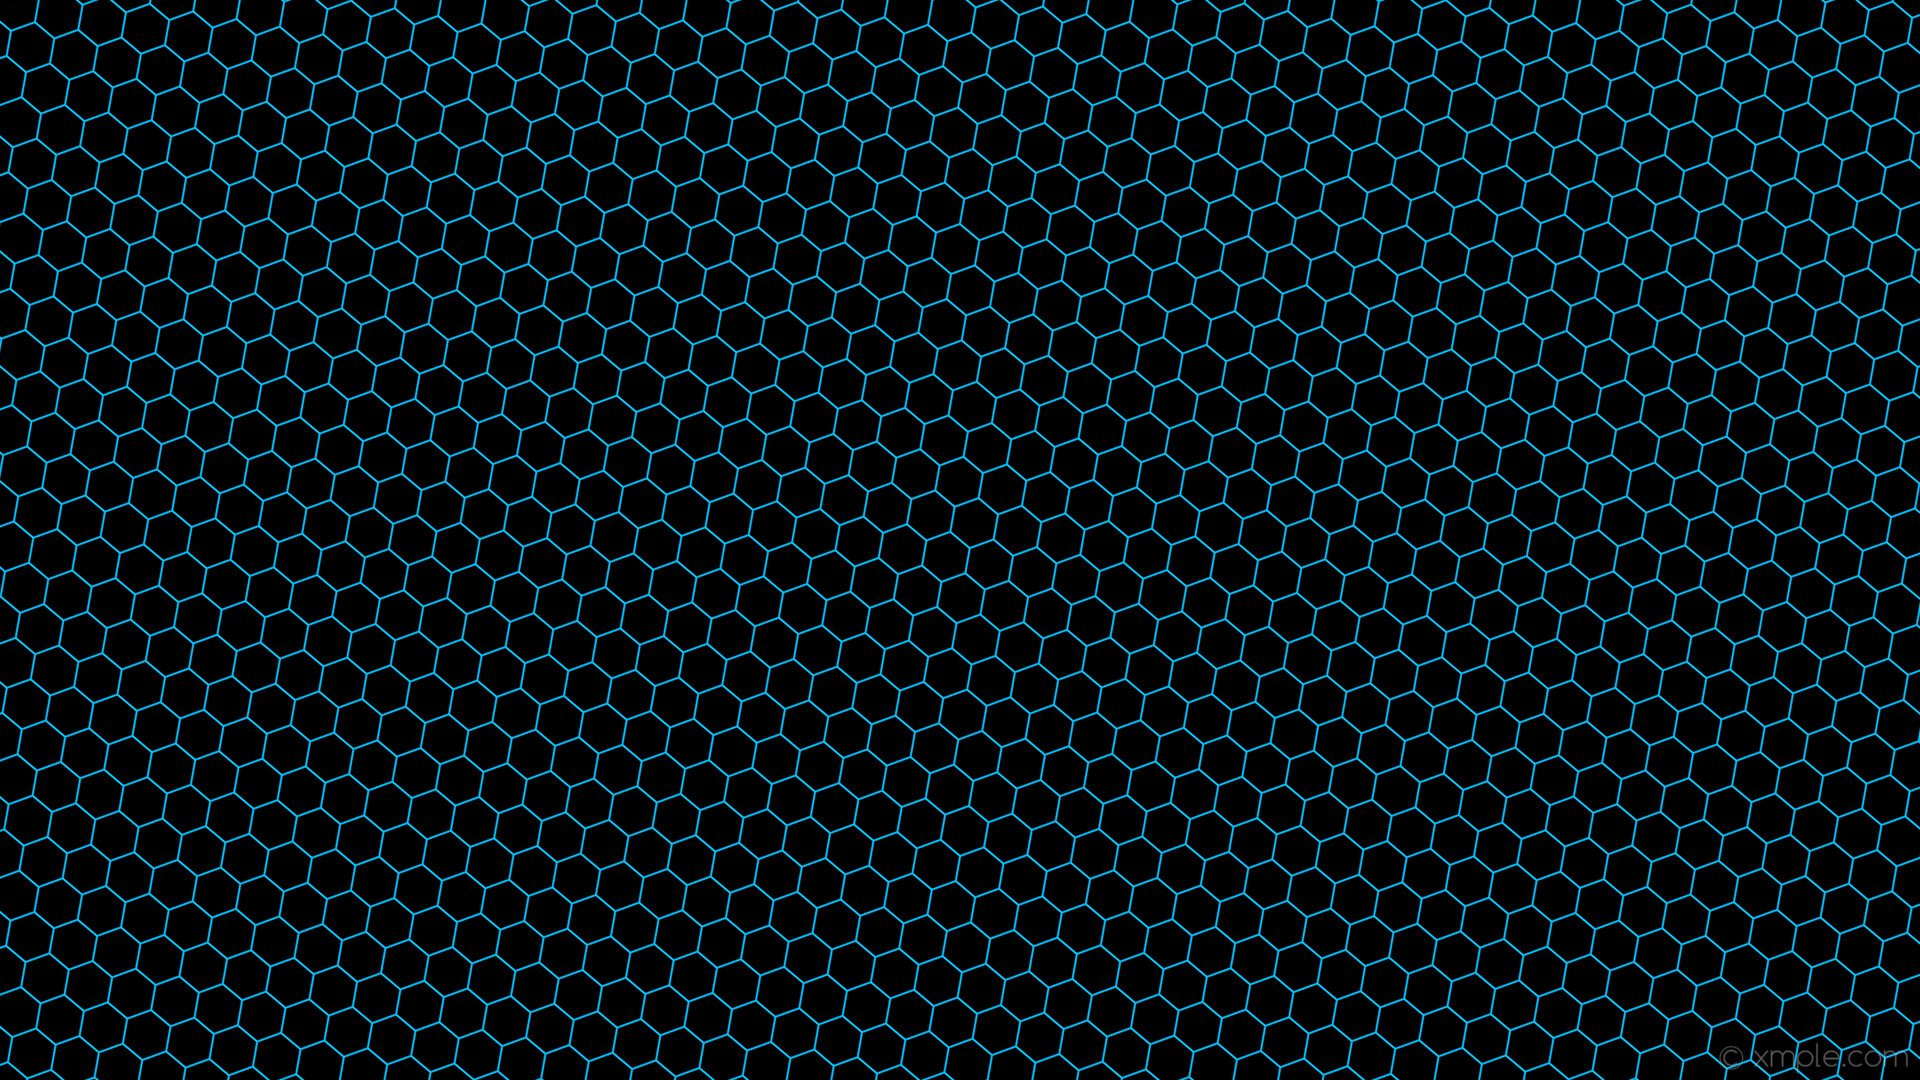 wallpaper honeycomb blue beehive hexagon black deep sky blue #000000  #00bfff diagonal 50°